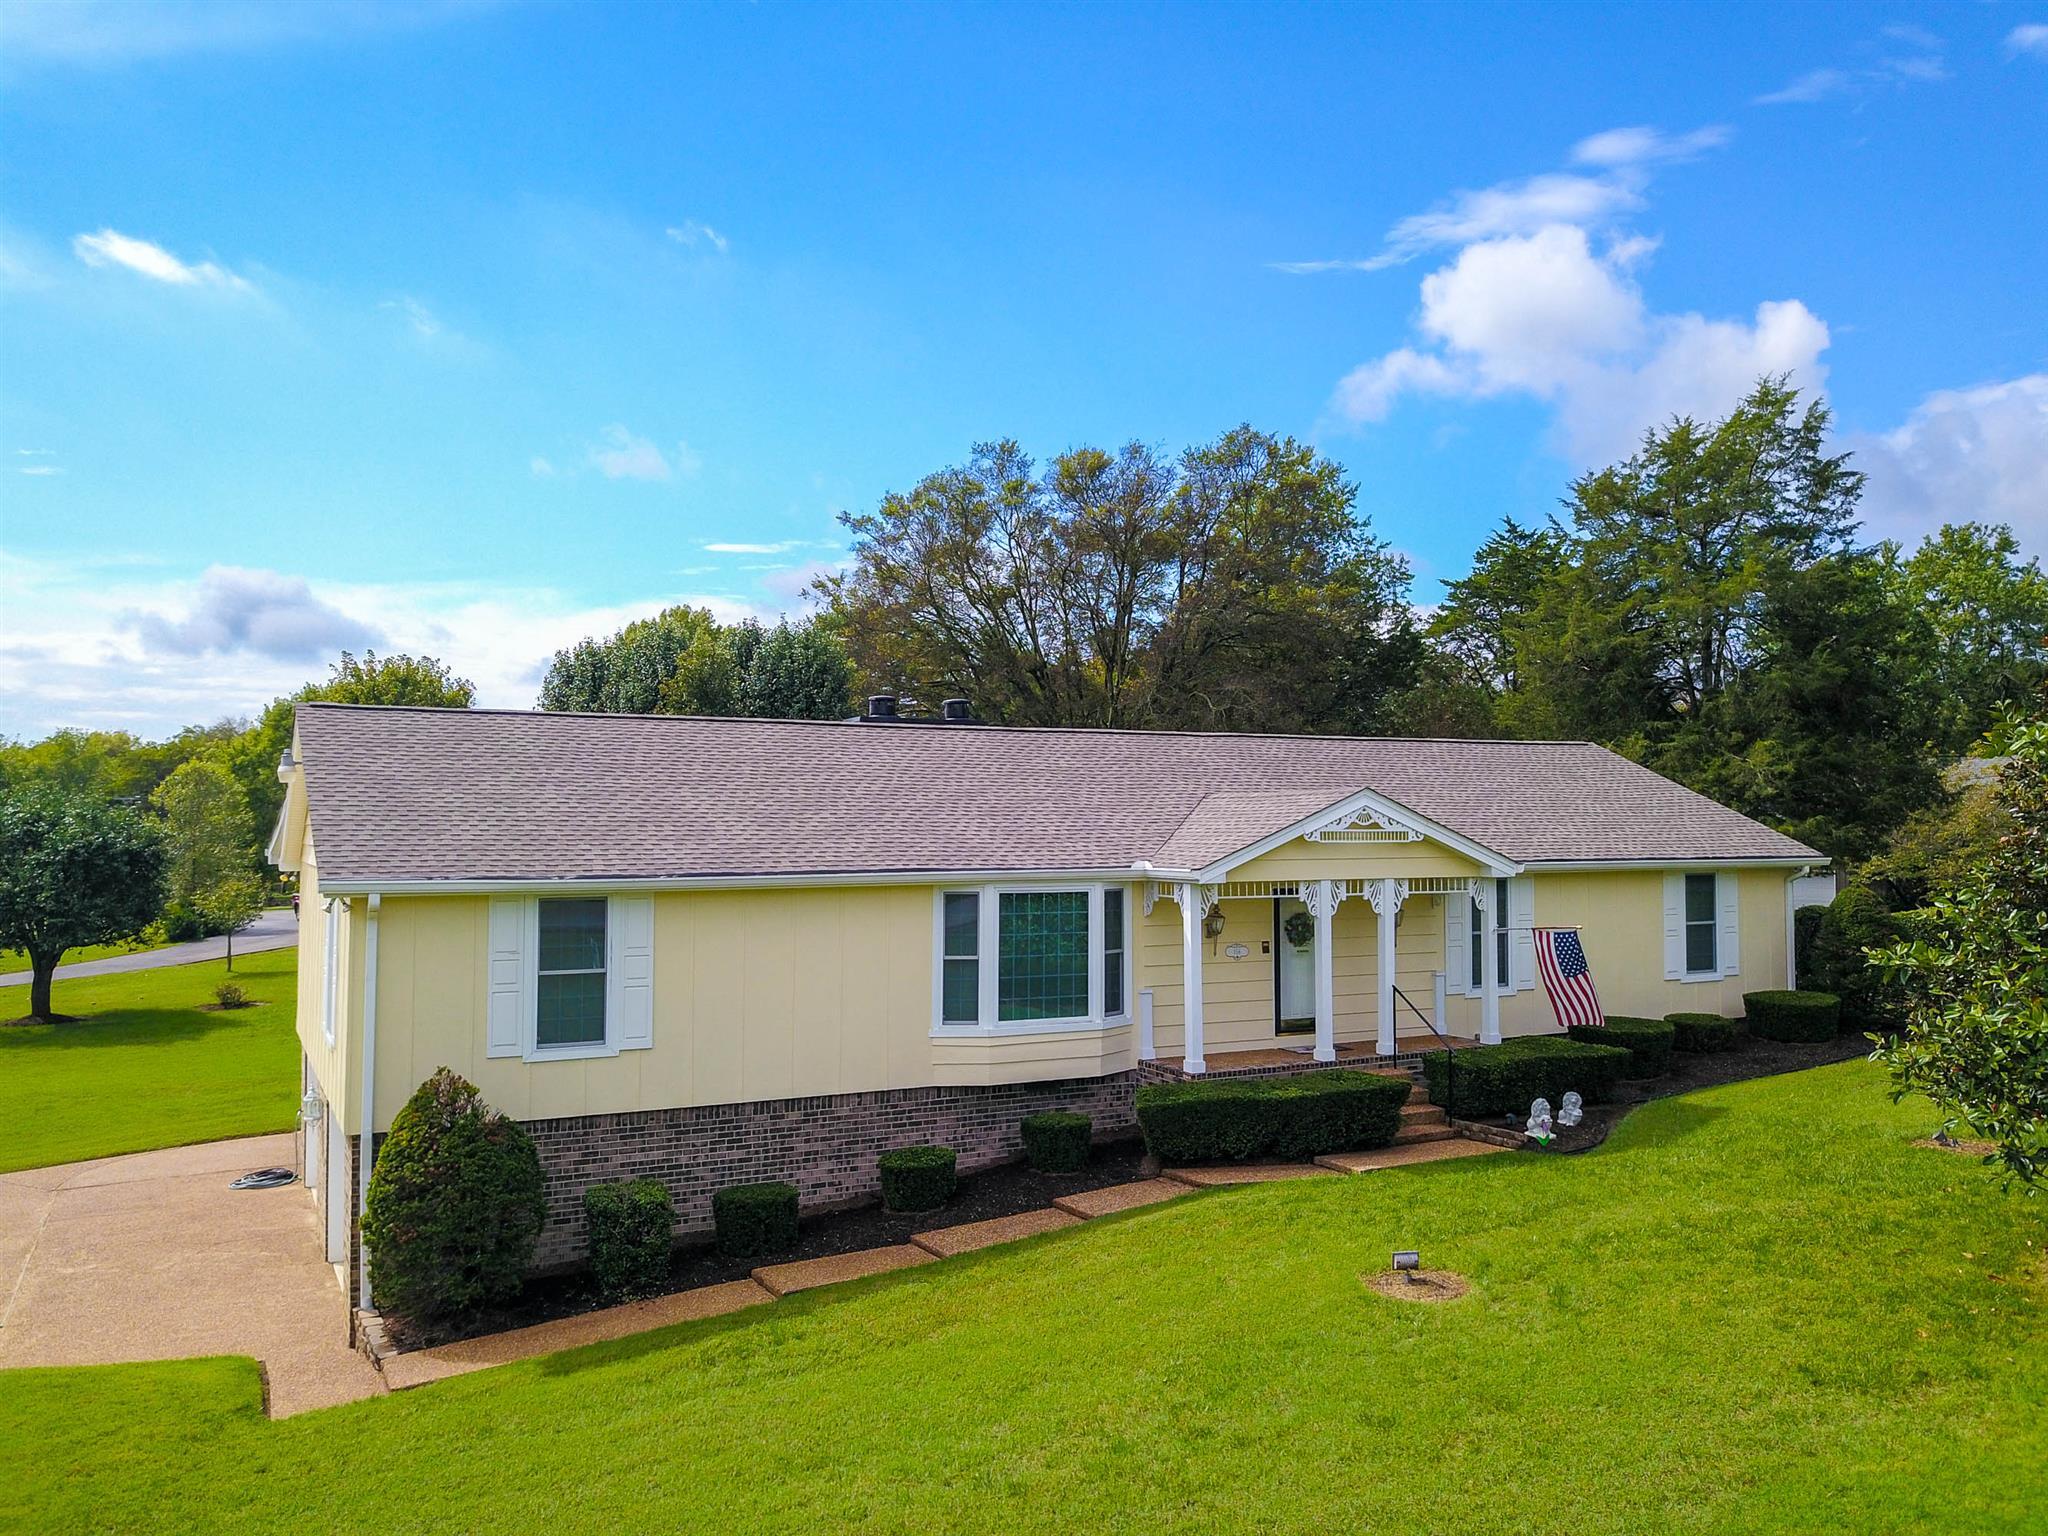 156 Bluegrass Dr Hendersonville, TN 37075